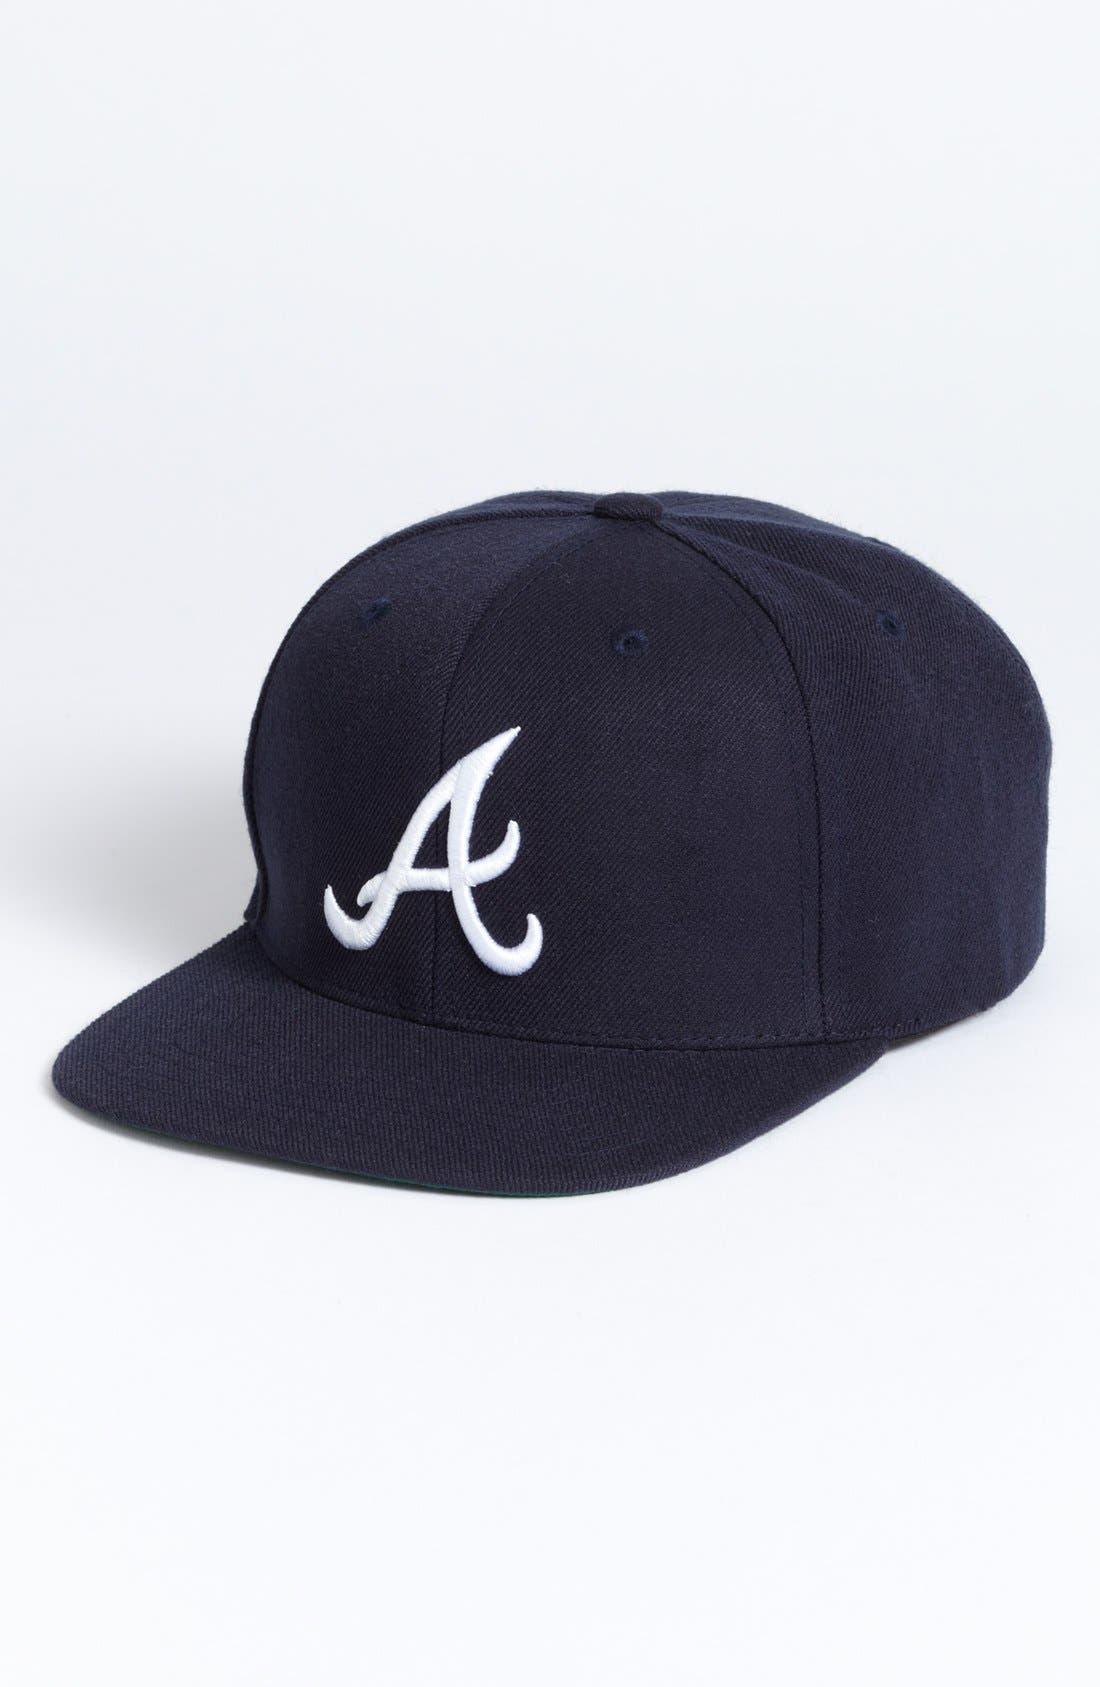 Main Image - American Needle 'Atlanta Braves - 400 Series' Snapback Baseball Cap